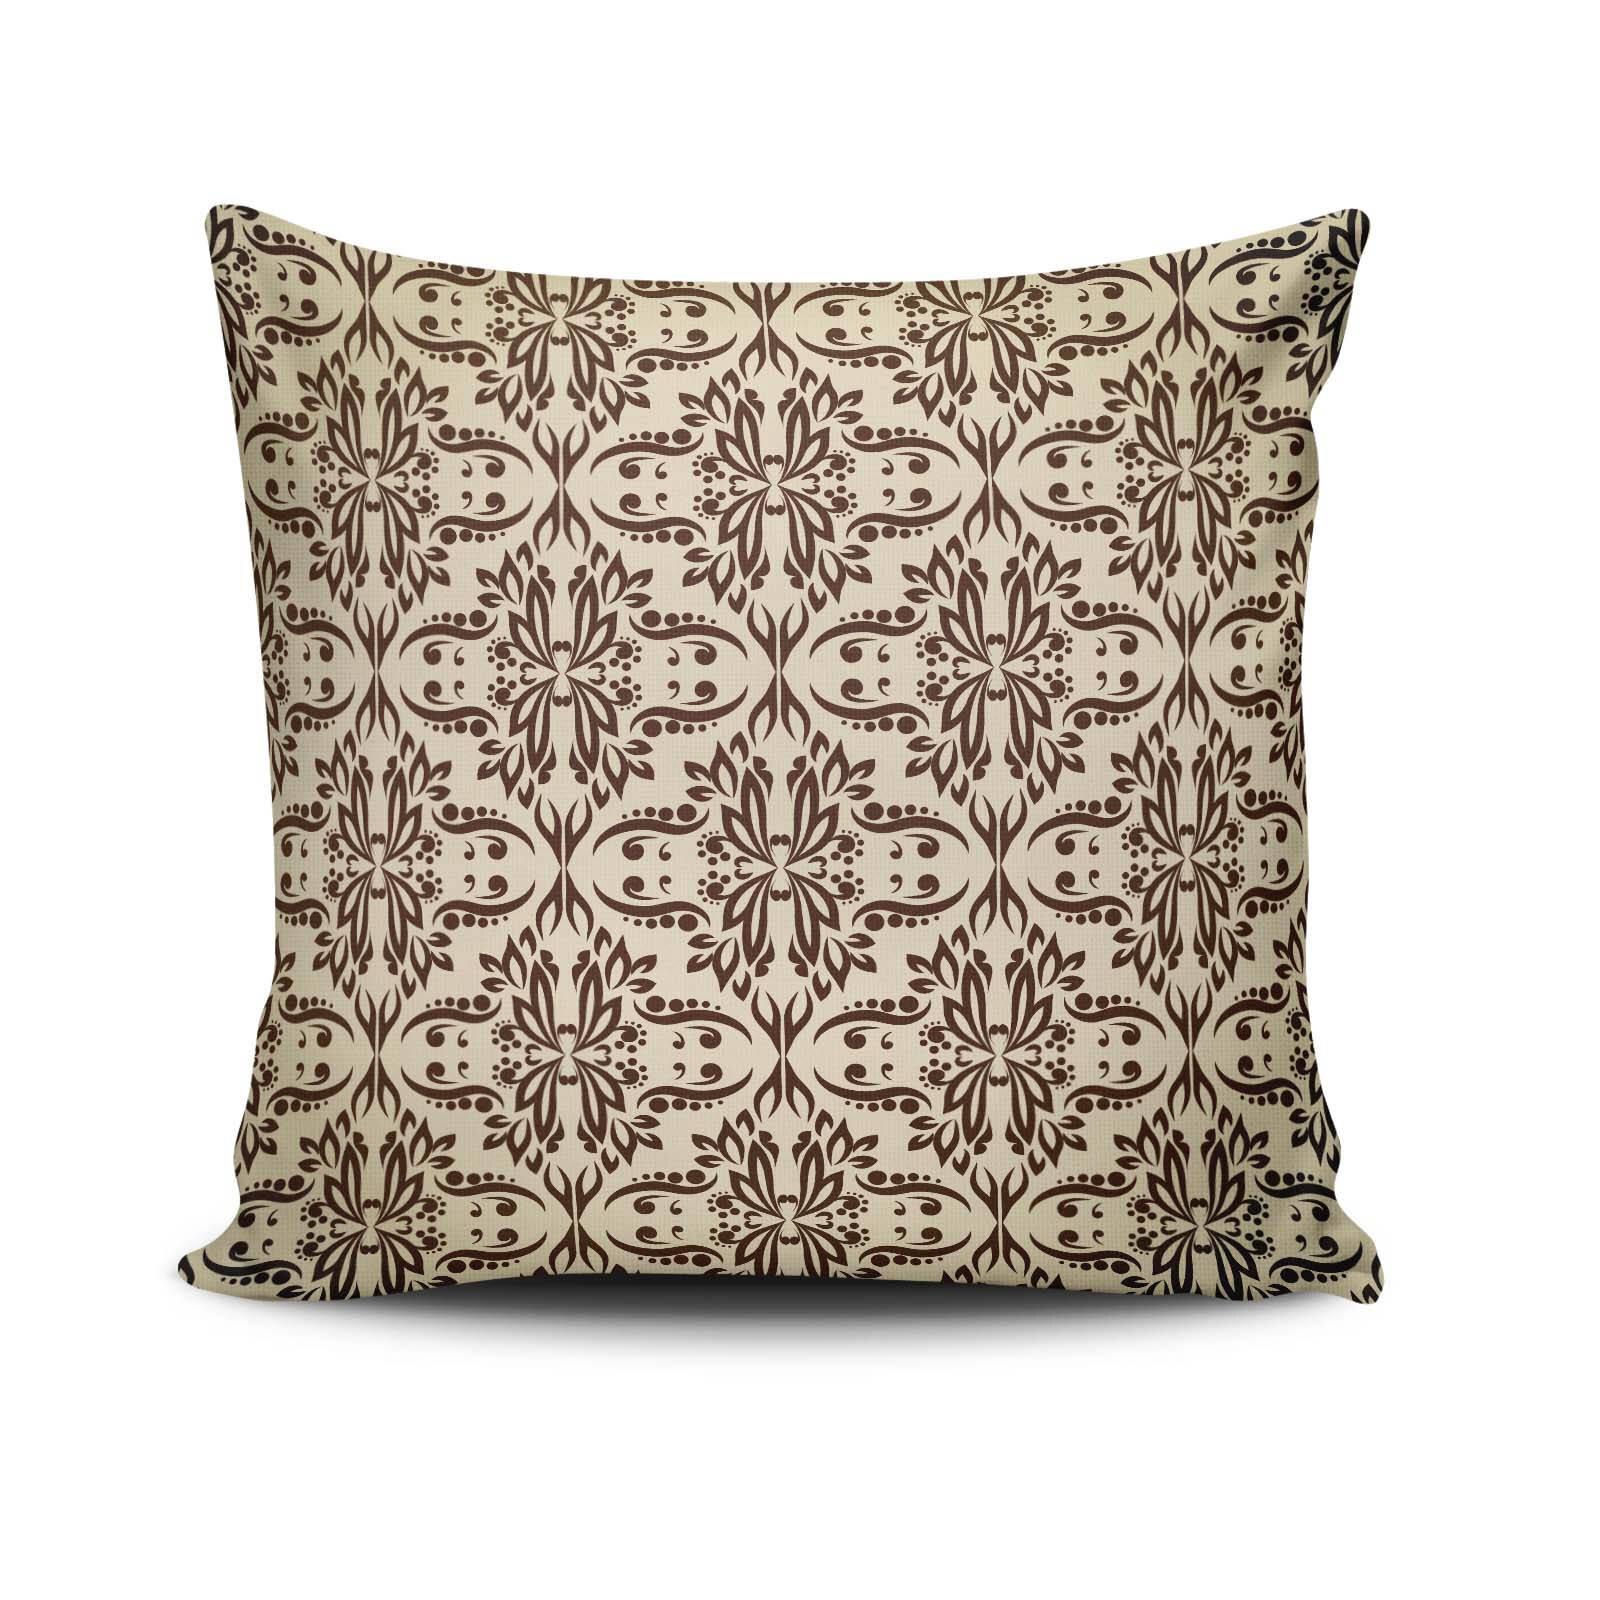 Perna decorativa Spiffy, Dimensiune: 45 x 45 cm, Material exterior: 50% bumbac / 50% poliester 425SPF0101